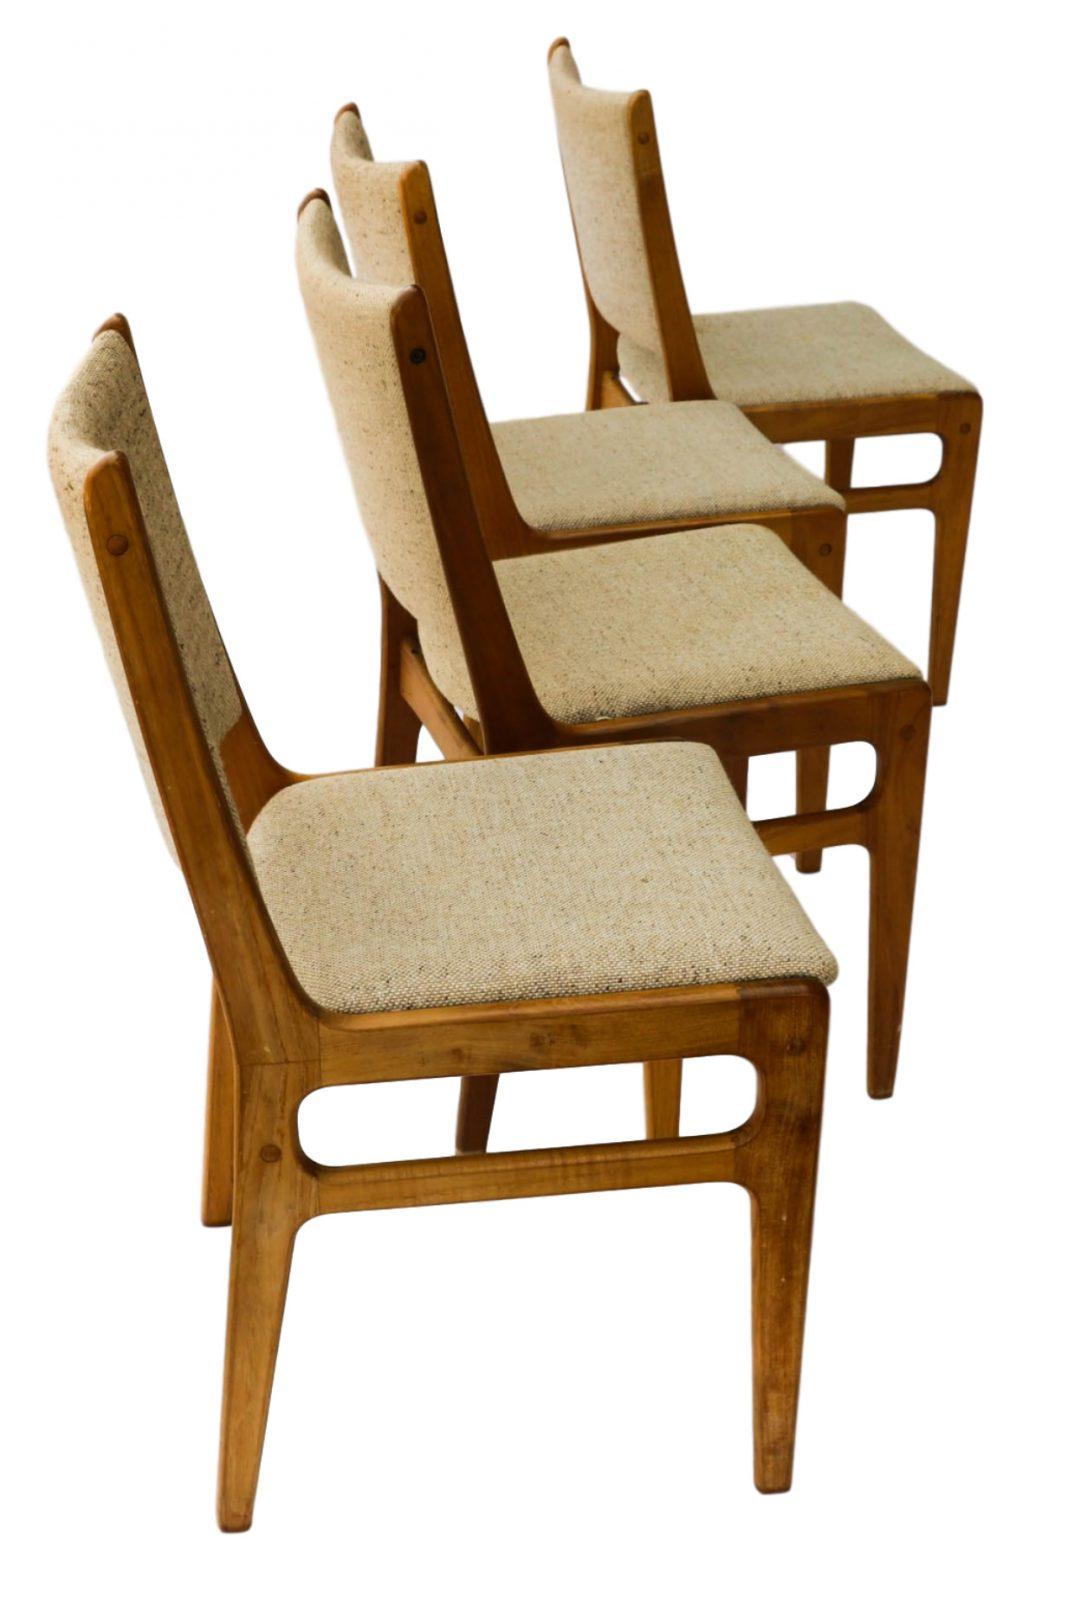 Vintage D Scan Danish Teak Dining Chairs Four